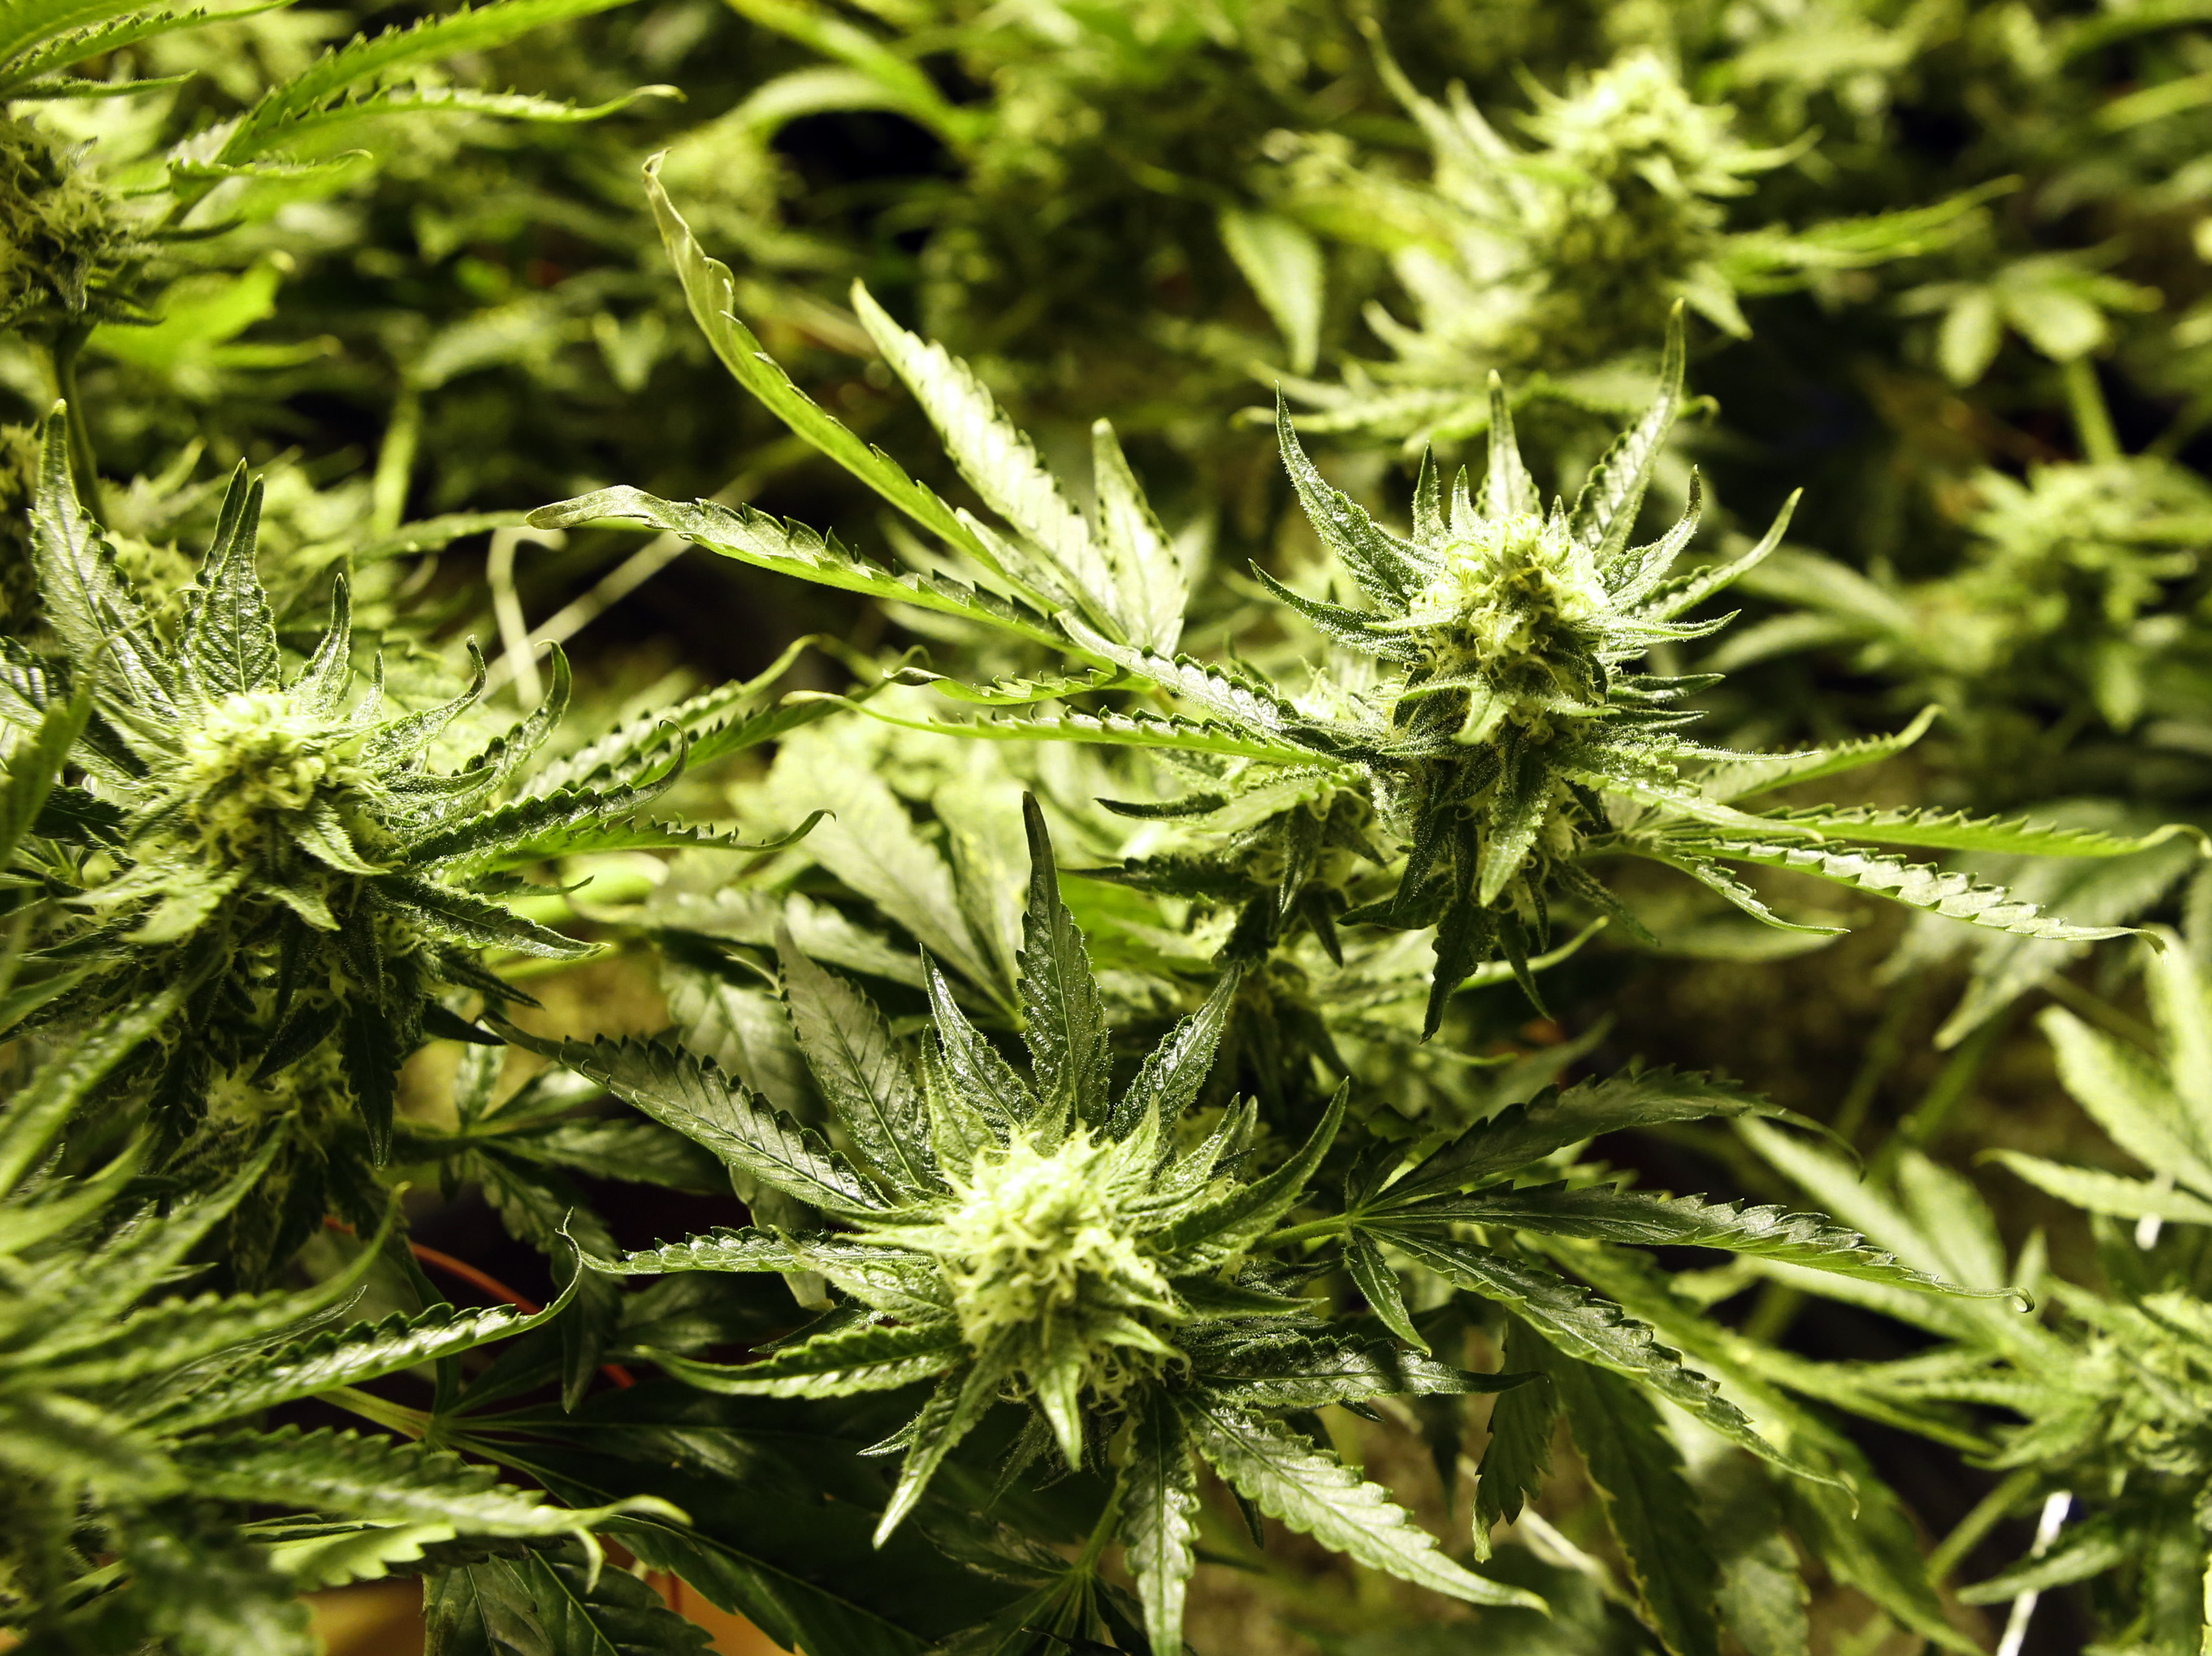 Colorado cops trawling Craigslist for illegal marijuana sales - Washington Times